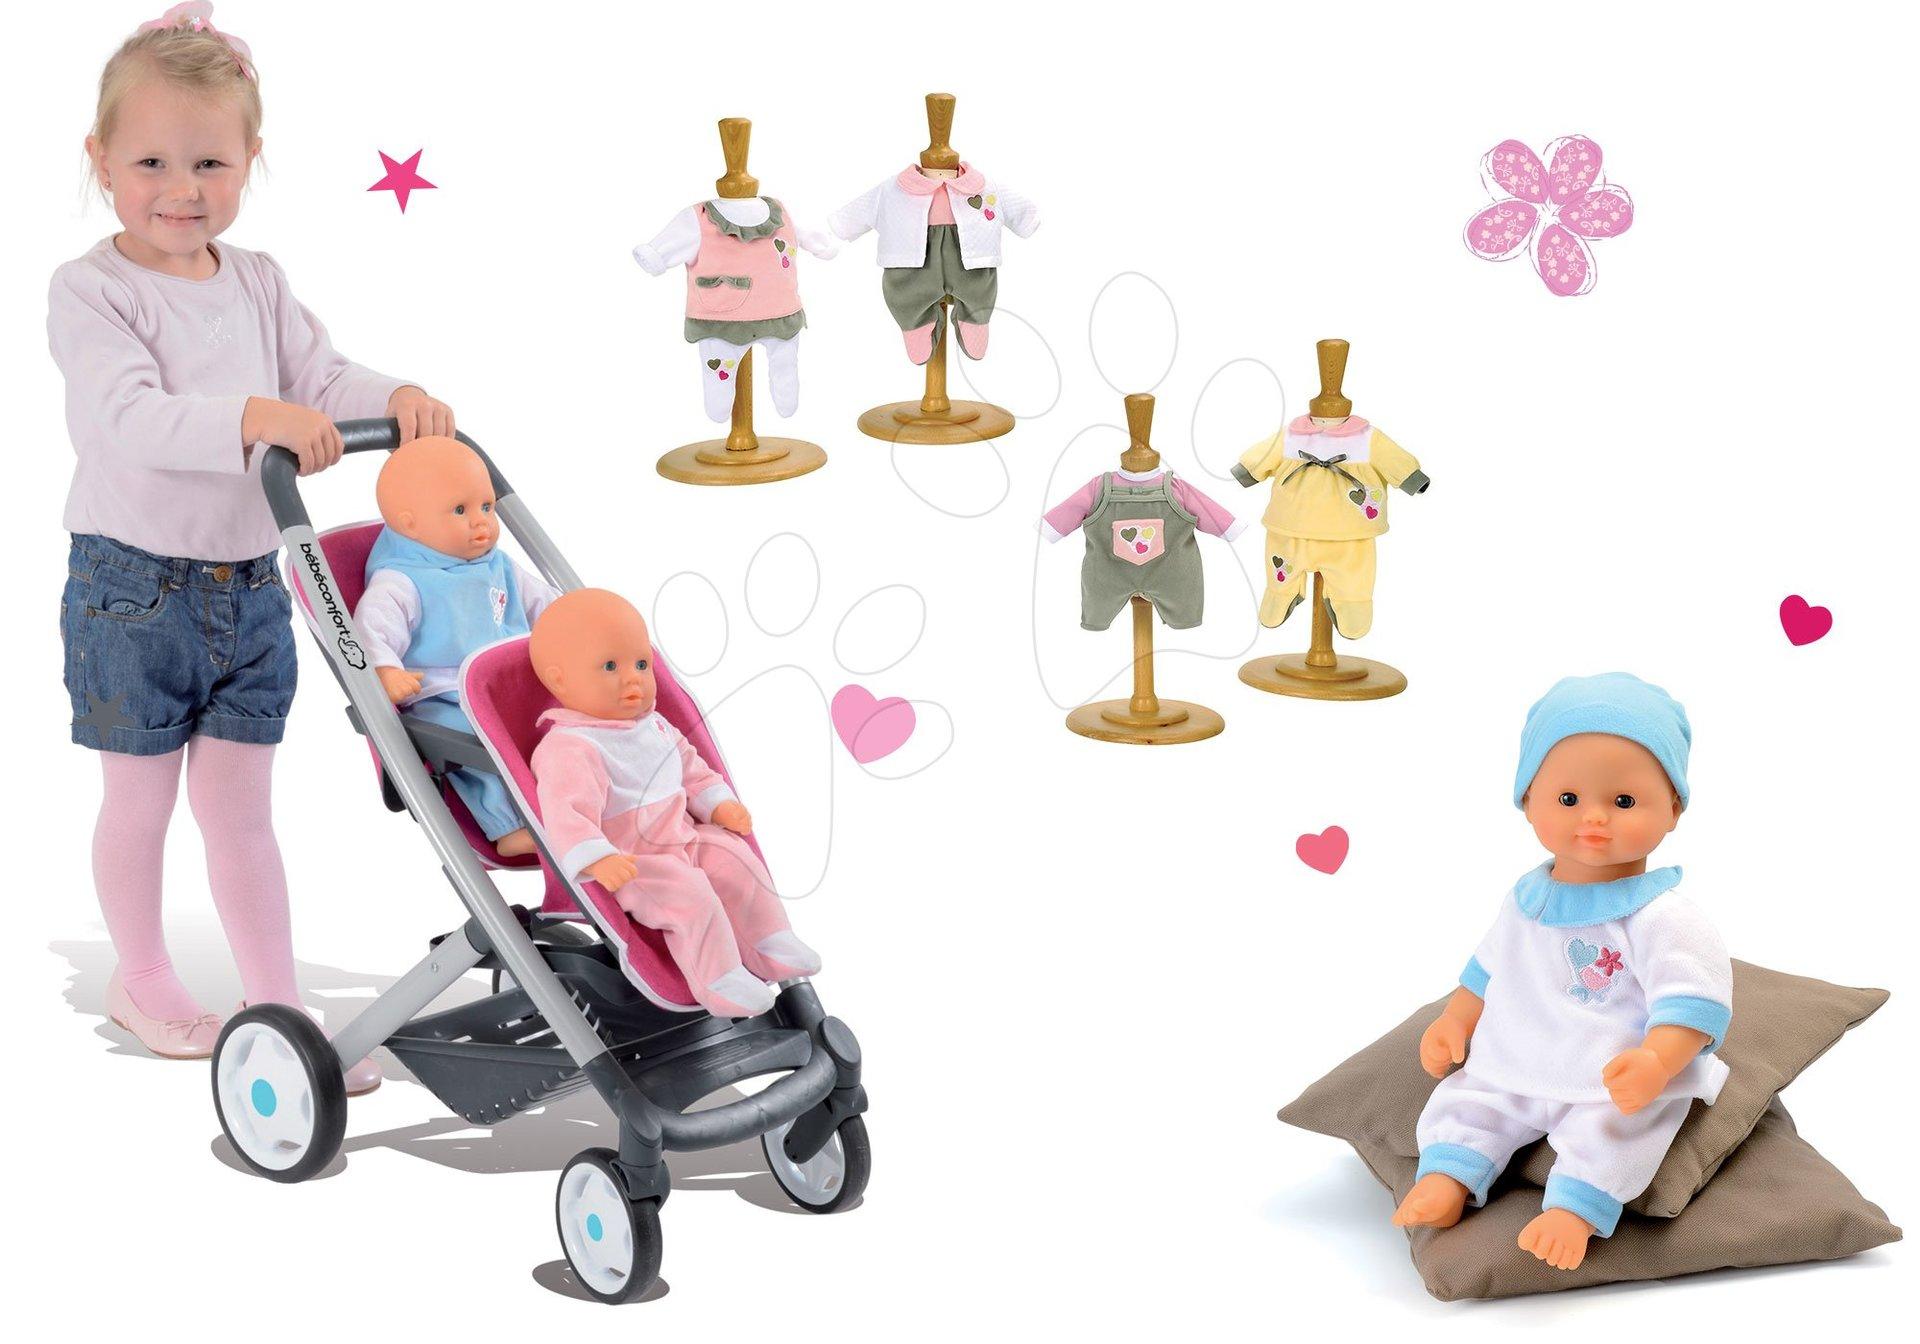 Smoby kočiarik pre bábiku Maxi Cosi & Quinny Twin a bábika so šatami Baby Nurse 521590-1